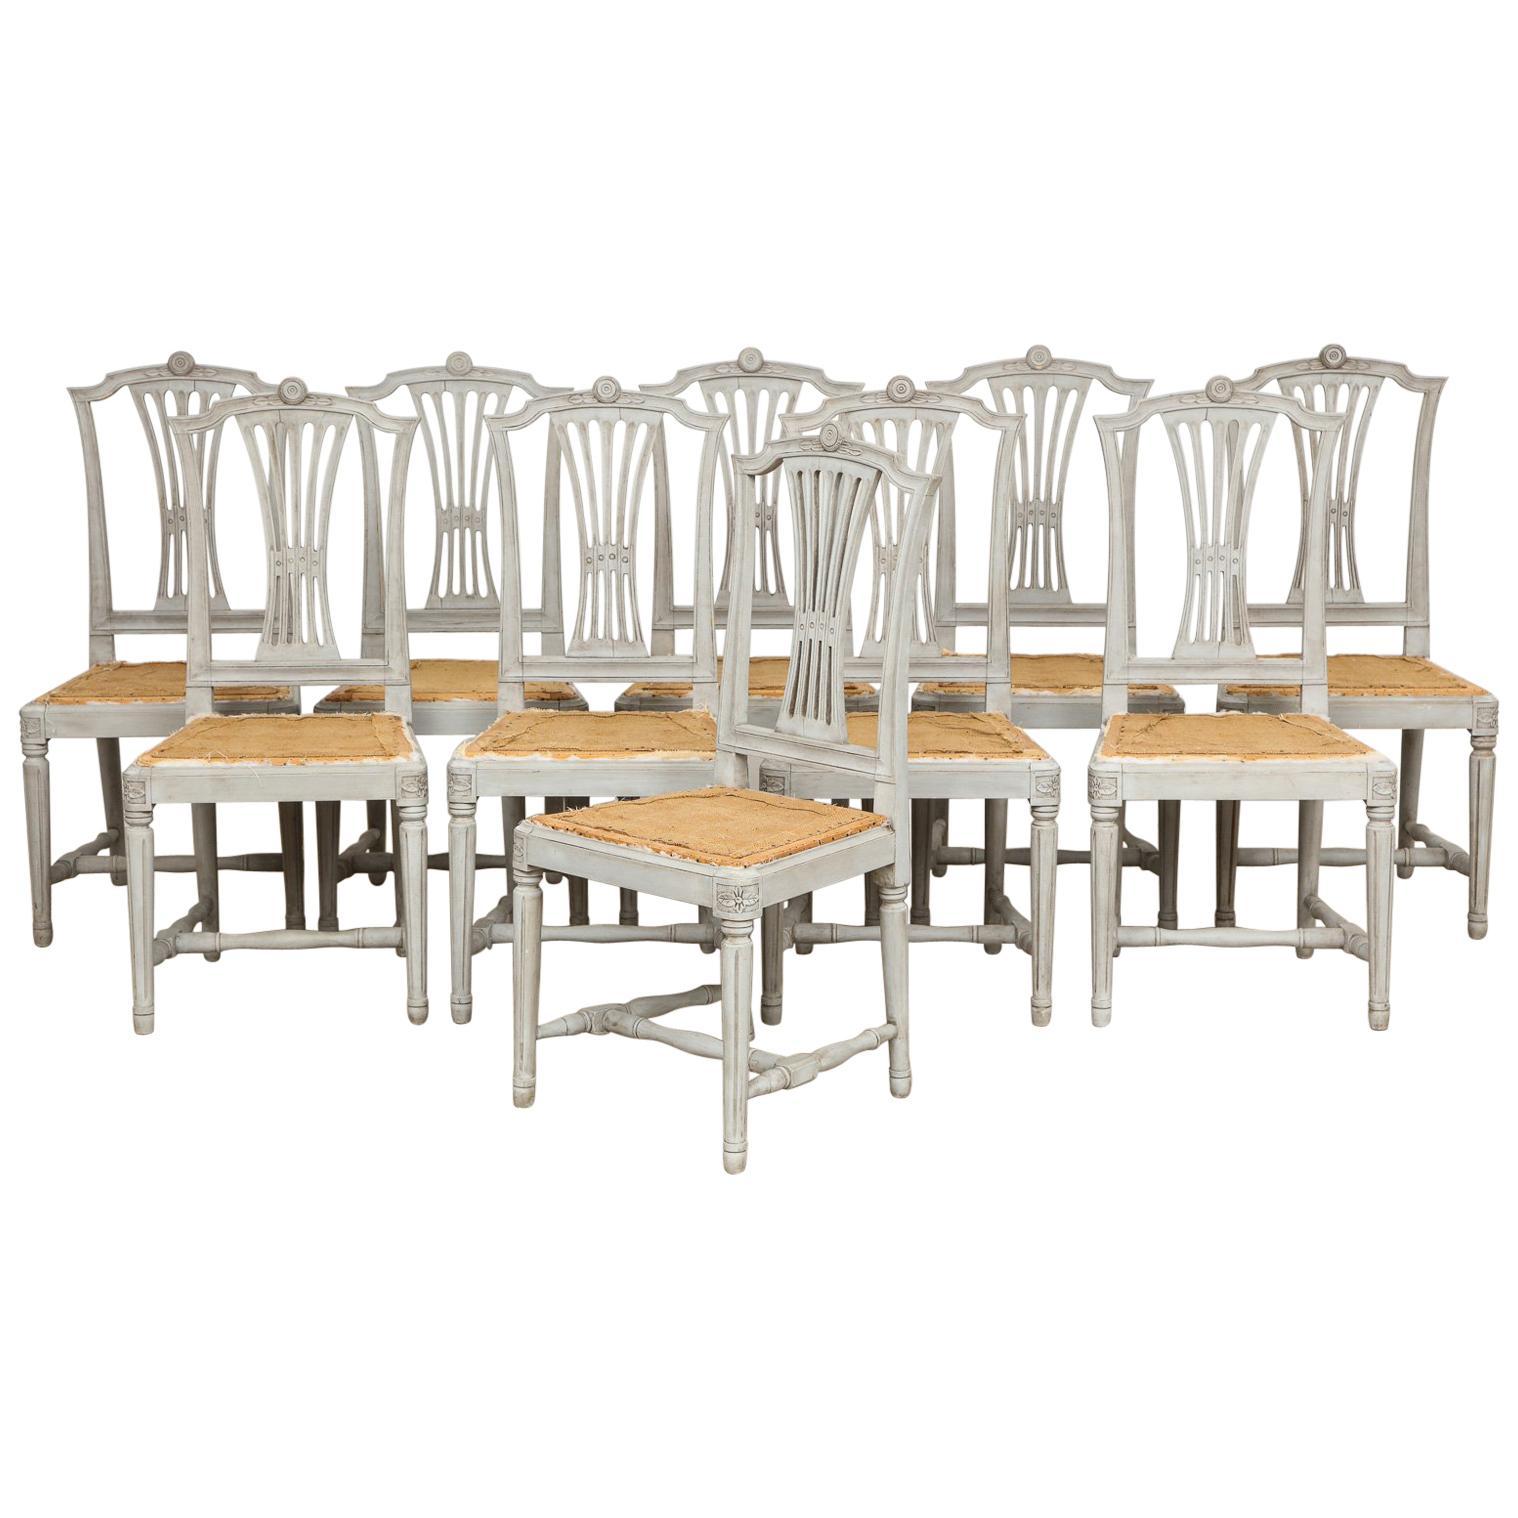 18th Century Set of Swedish Gustavian Chairs, Set of 10, Sweden, Circa 1790